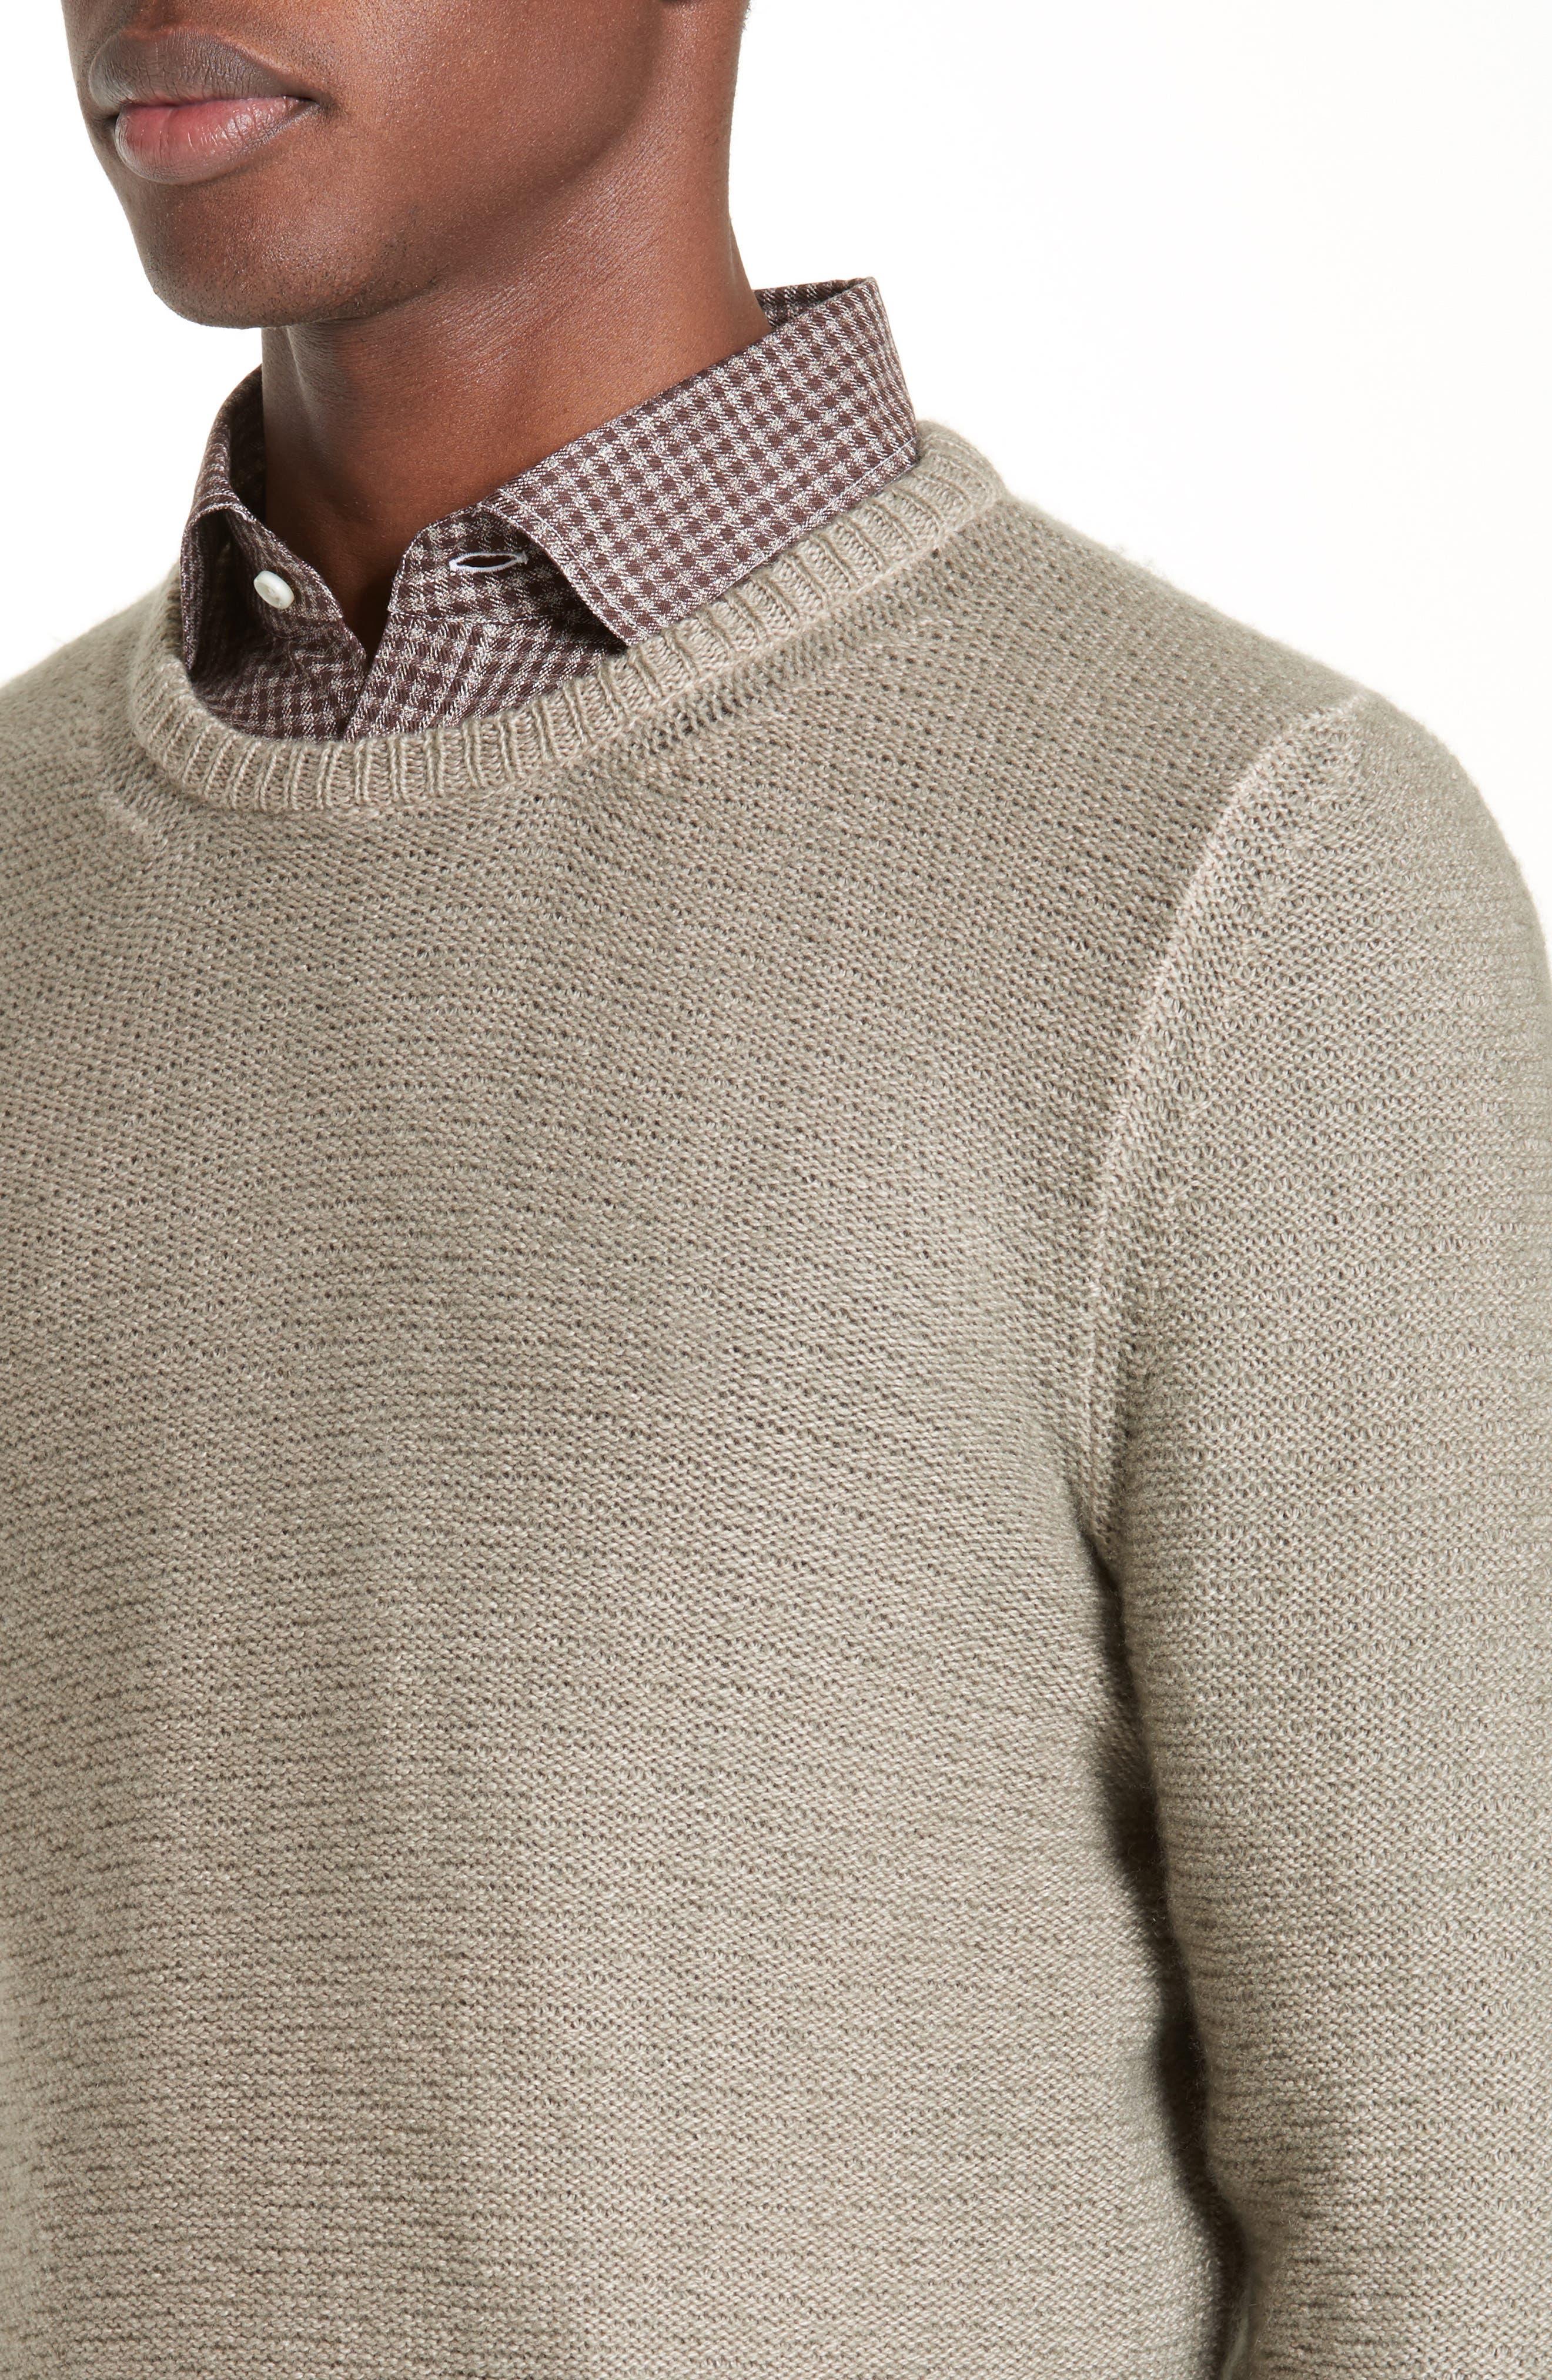 Napoli Slub Cashmere Sweater,                             Alternate thumbnail 4, color,                             200